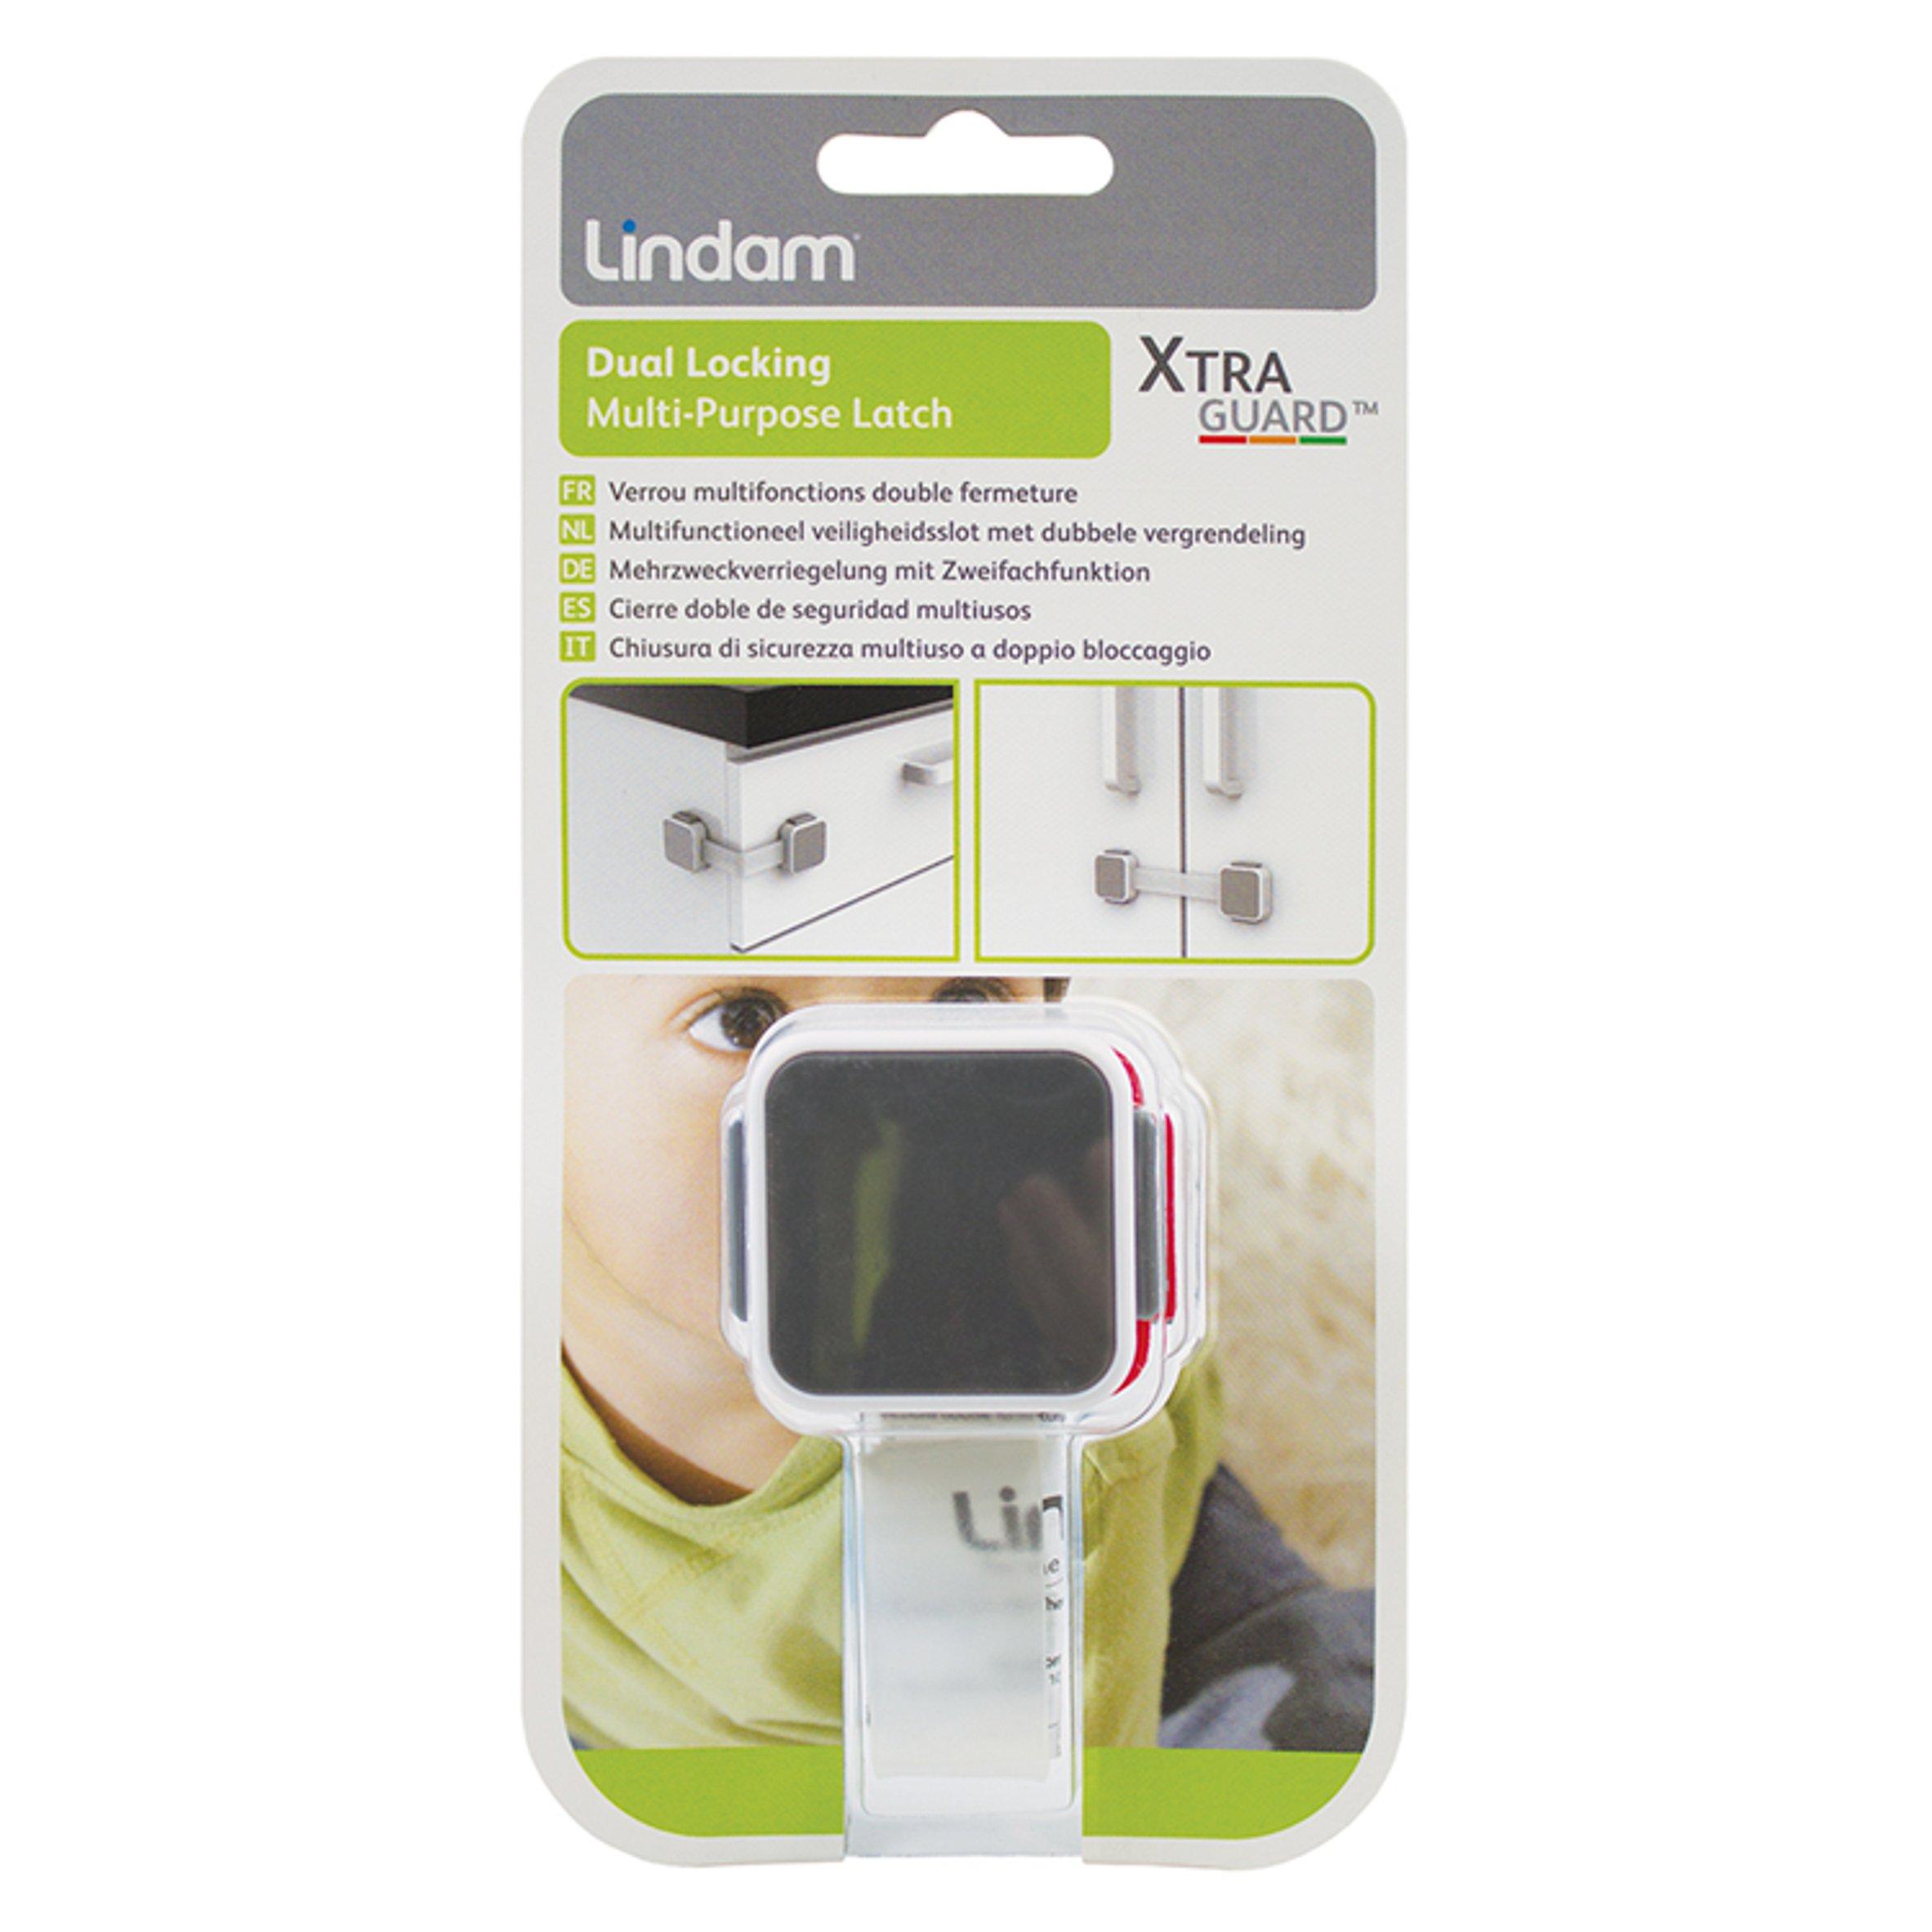 Lindam Xtra Guard Multi Purpose Latch